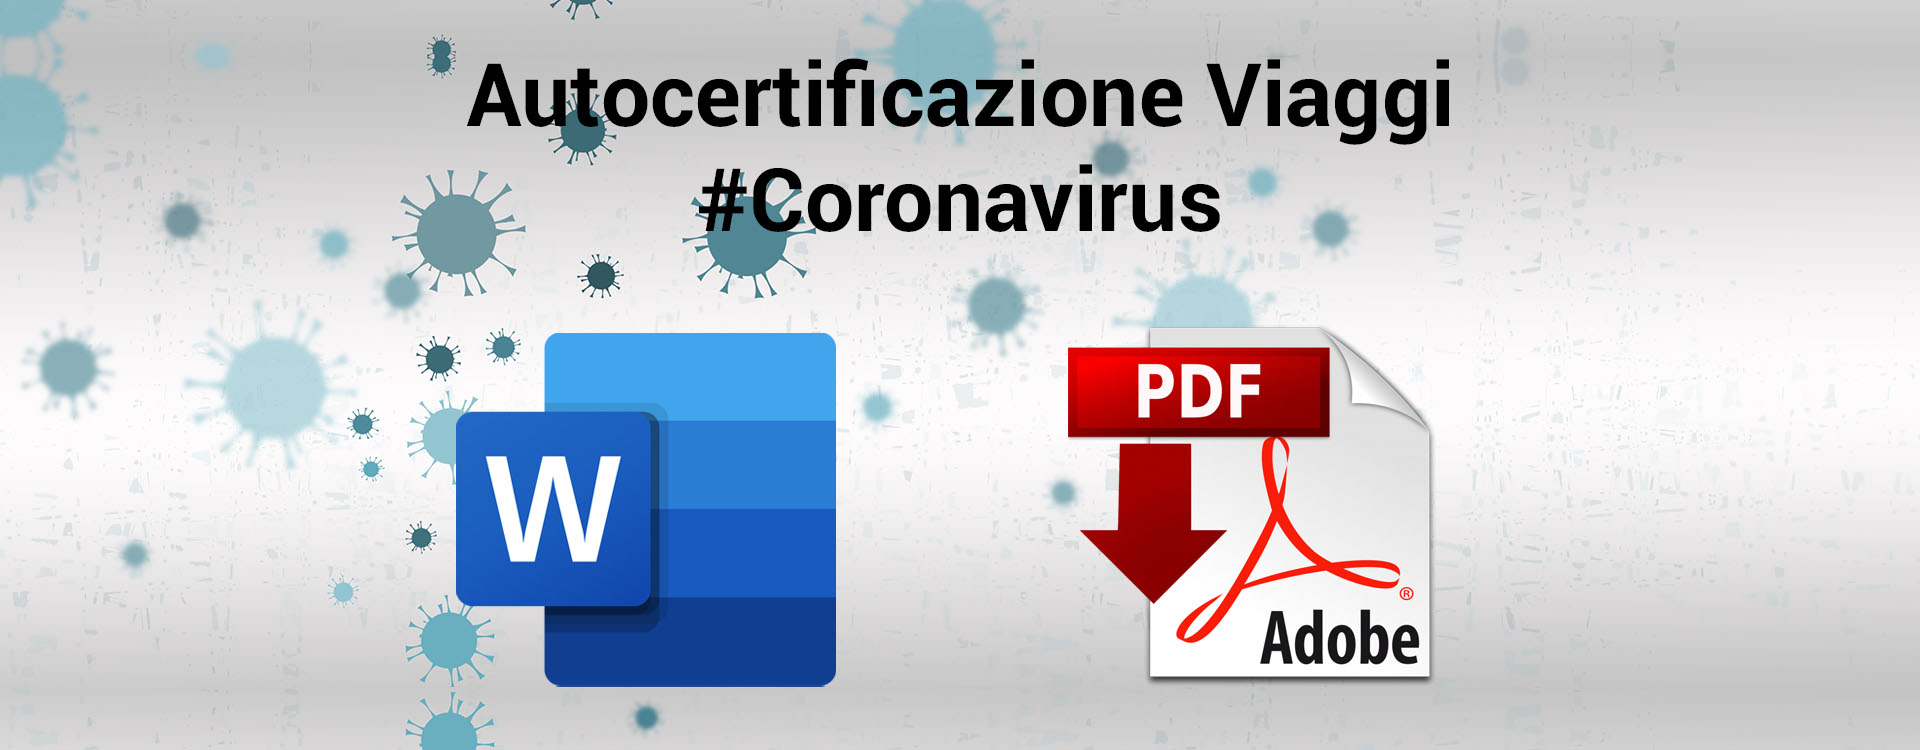 Scarica modiulo coronavirus